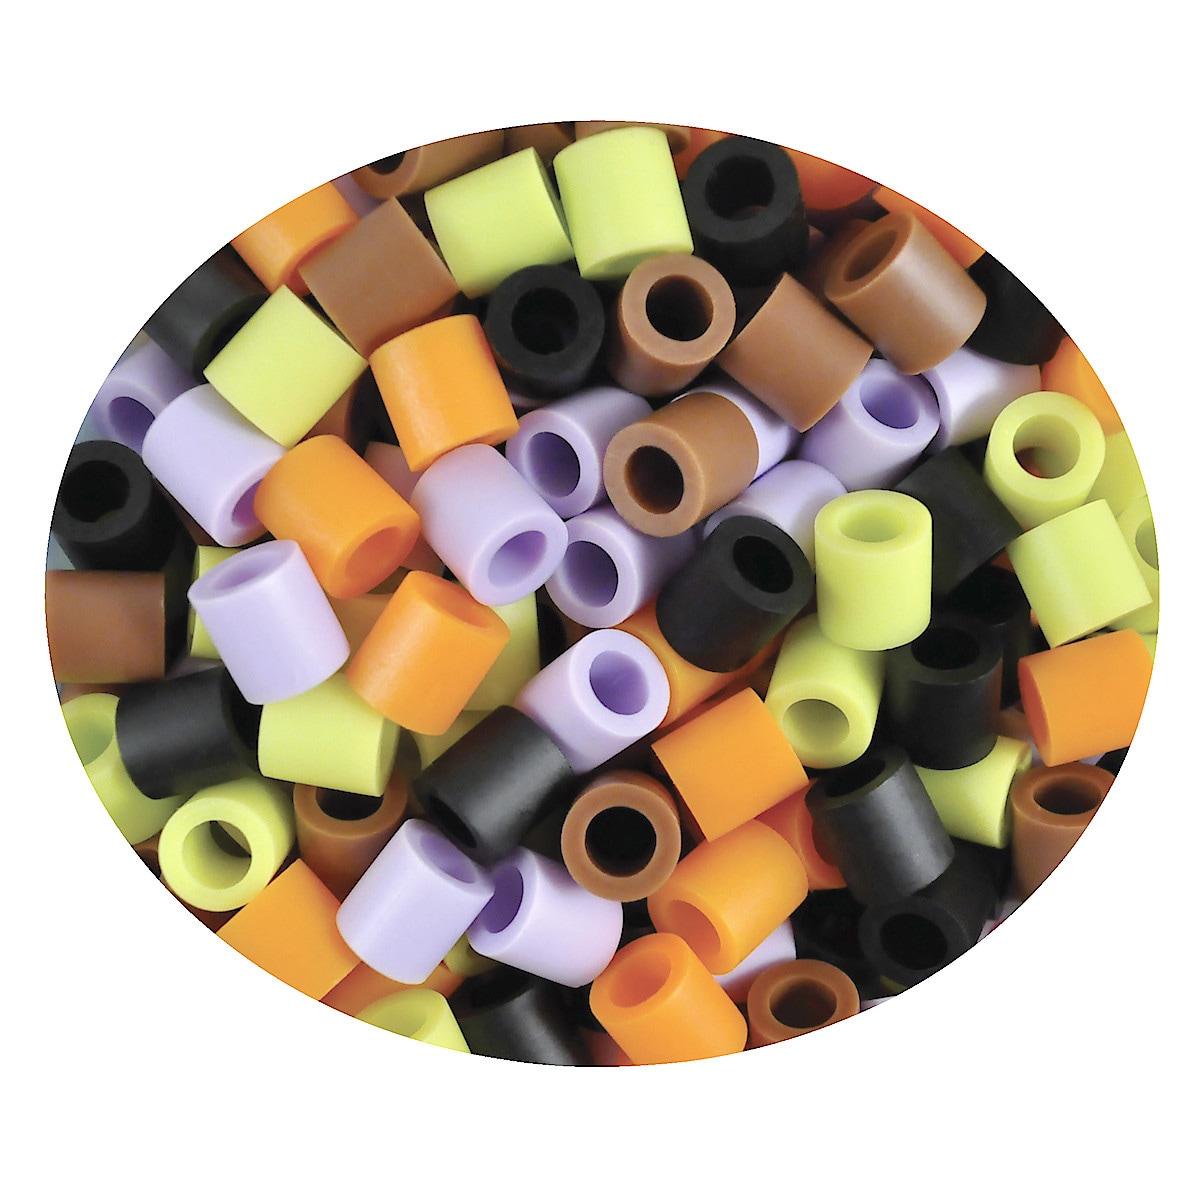 600 Jumbo Beads, 10 x 10 mm